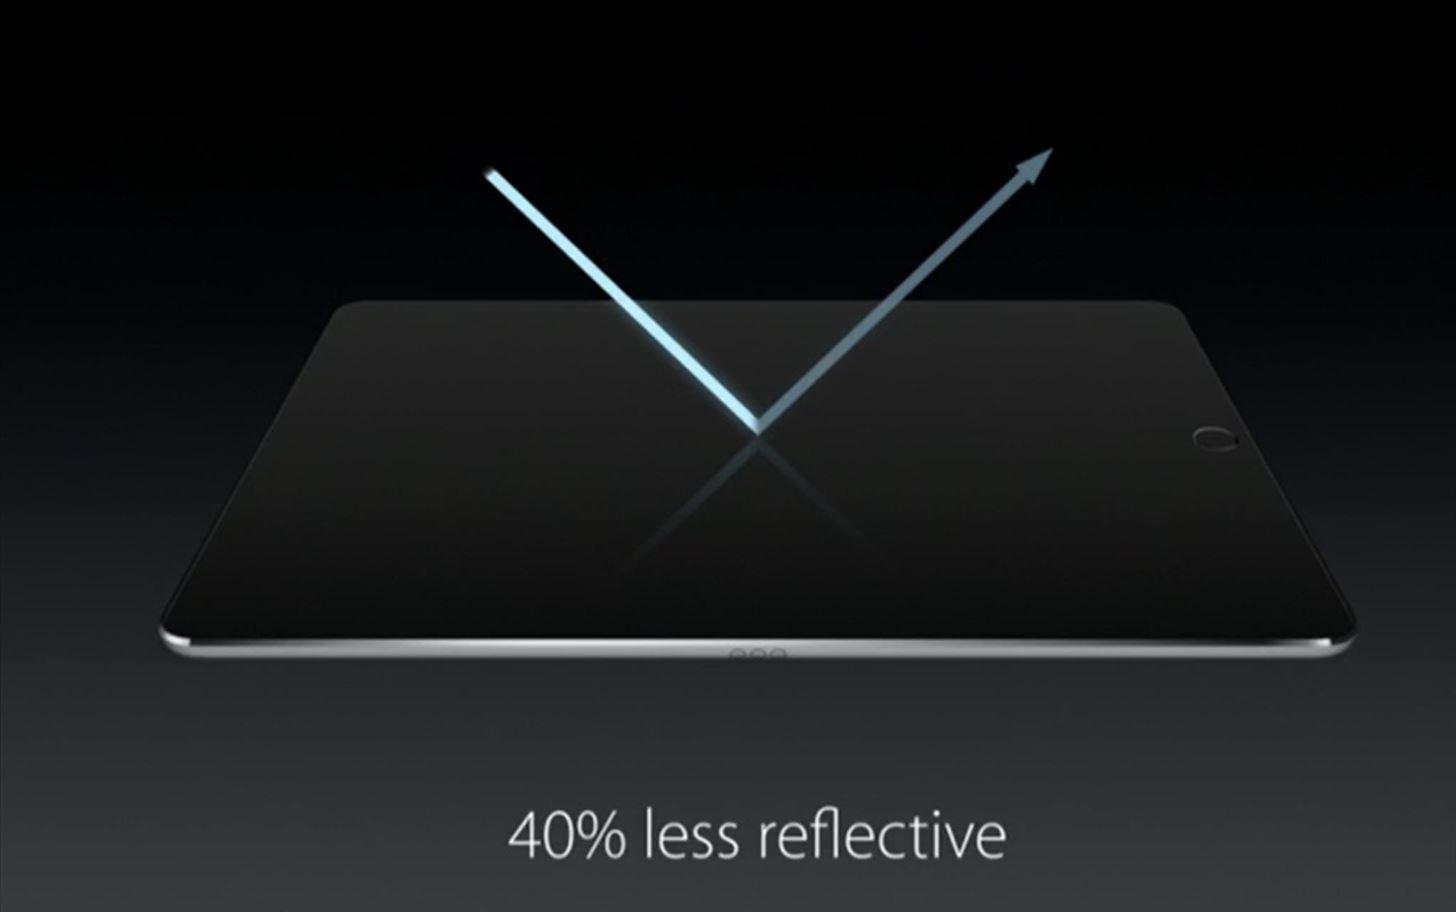 Apple Announces New iPad Pro: 9.7-Inch Screen, Better Audio, & More